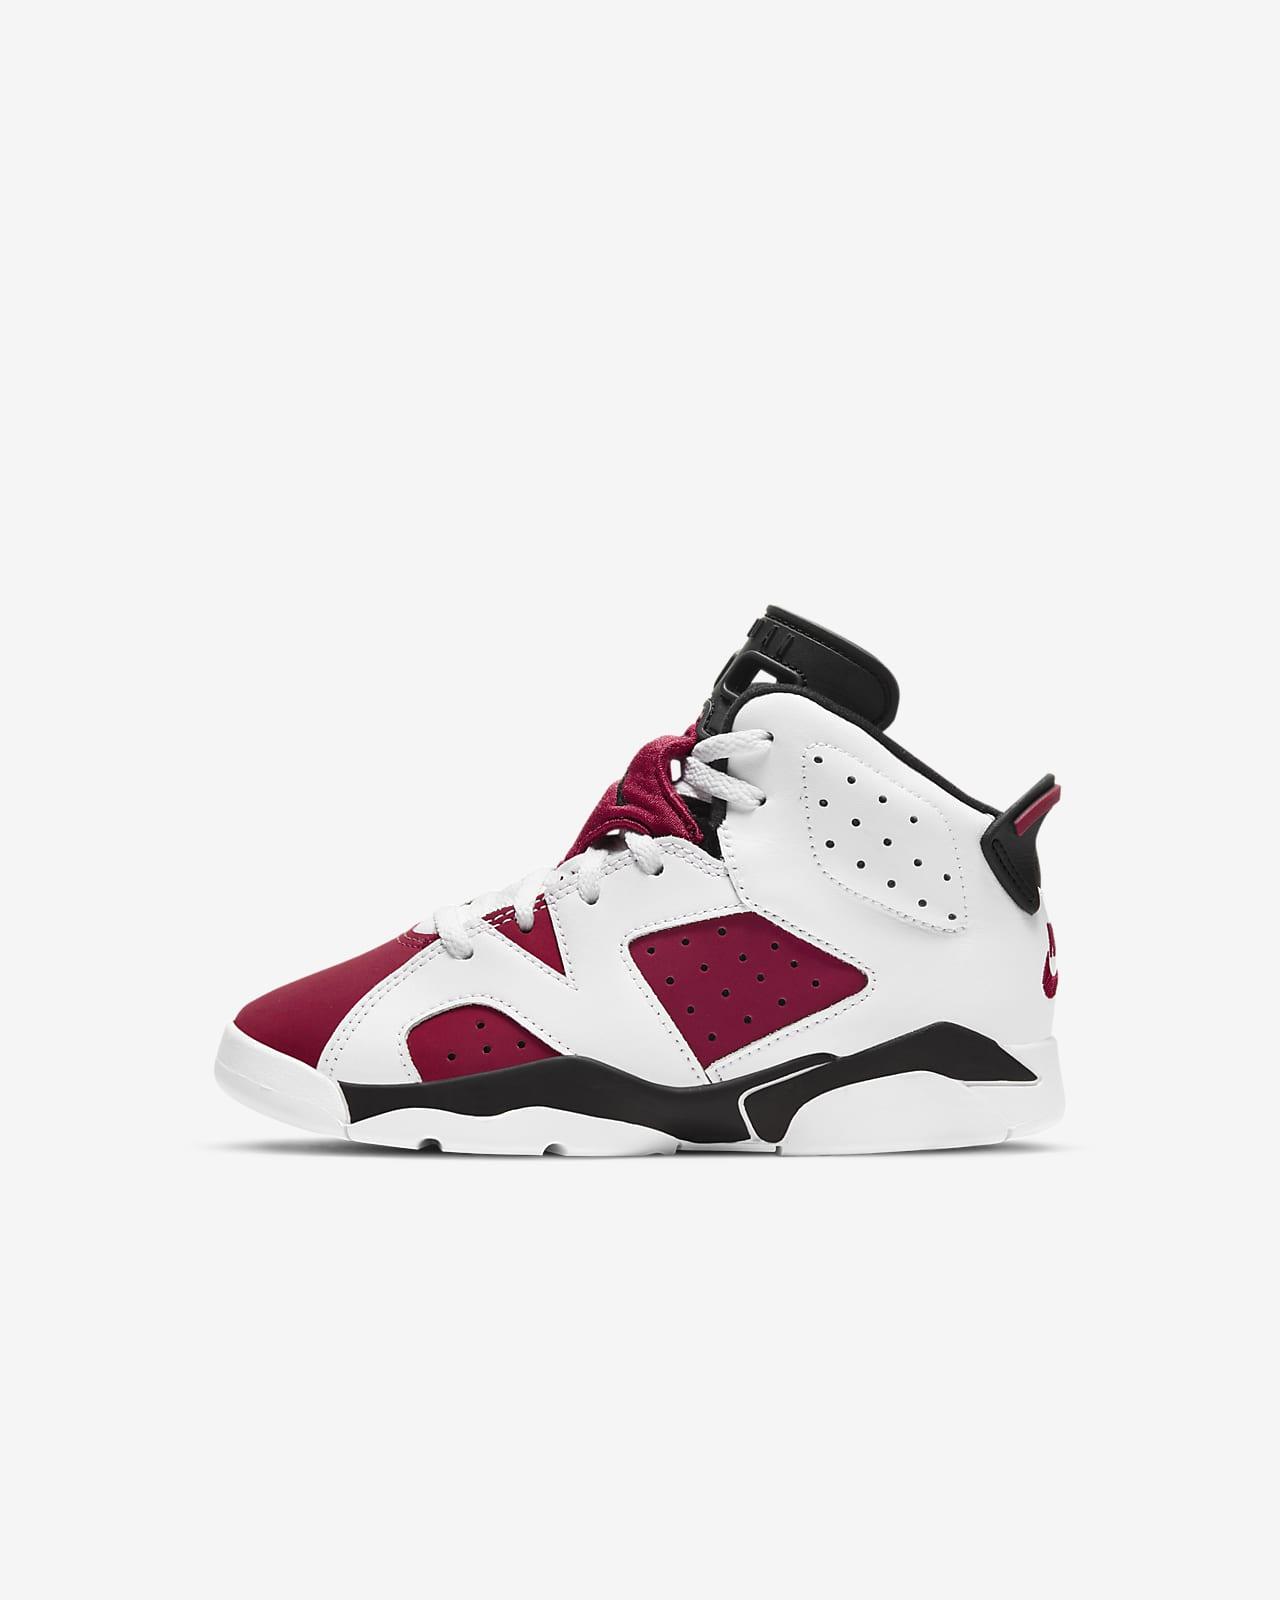 Jordan 6 Retro (PS) Schuh für jüngere Kinder